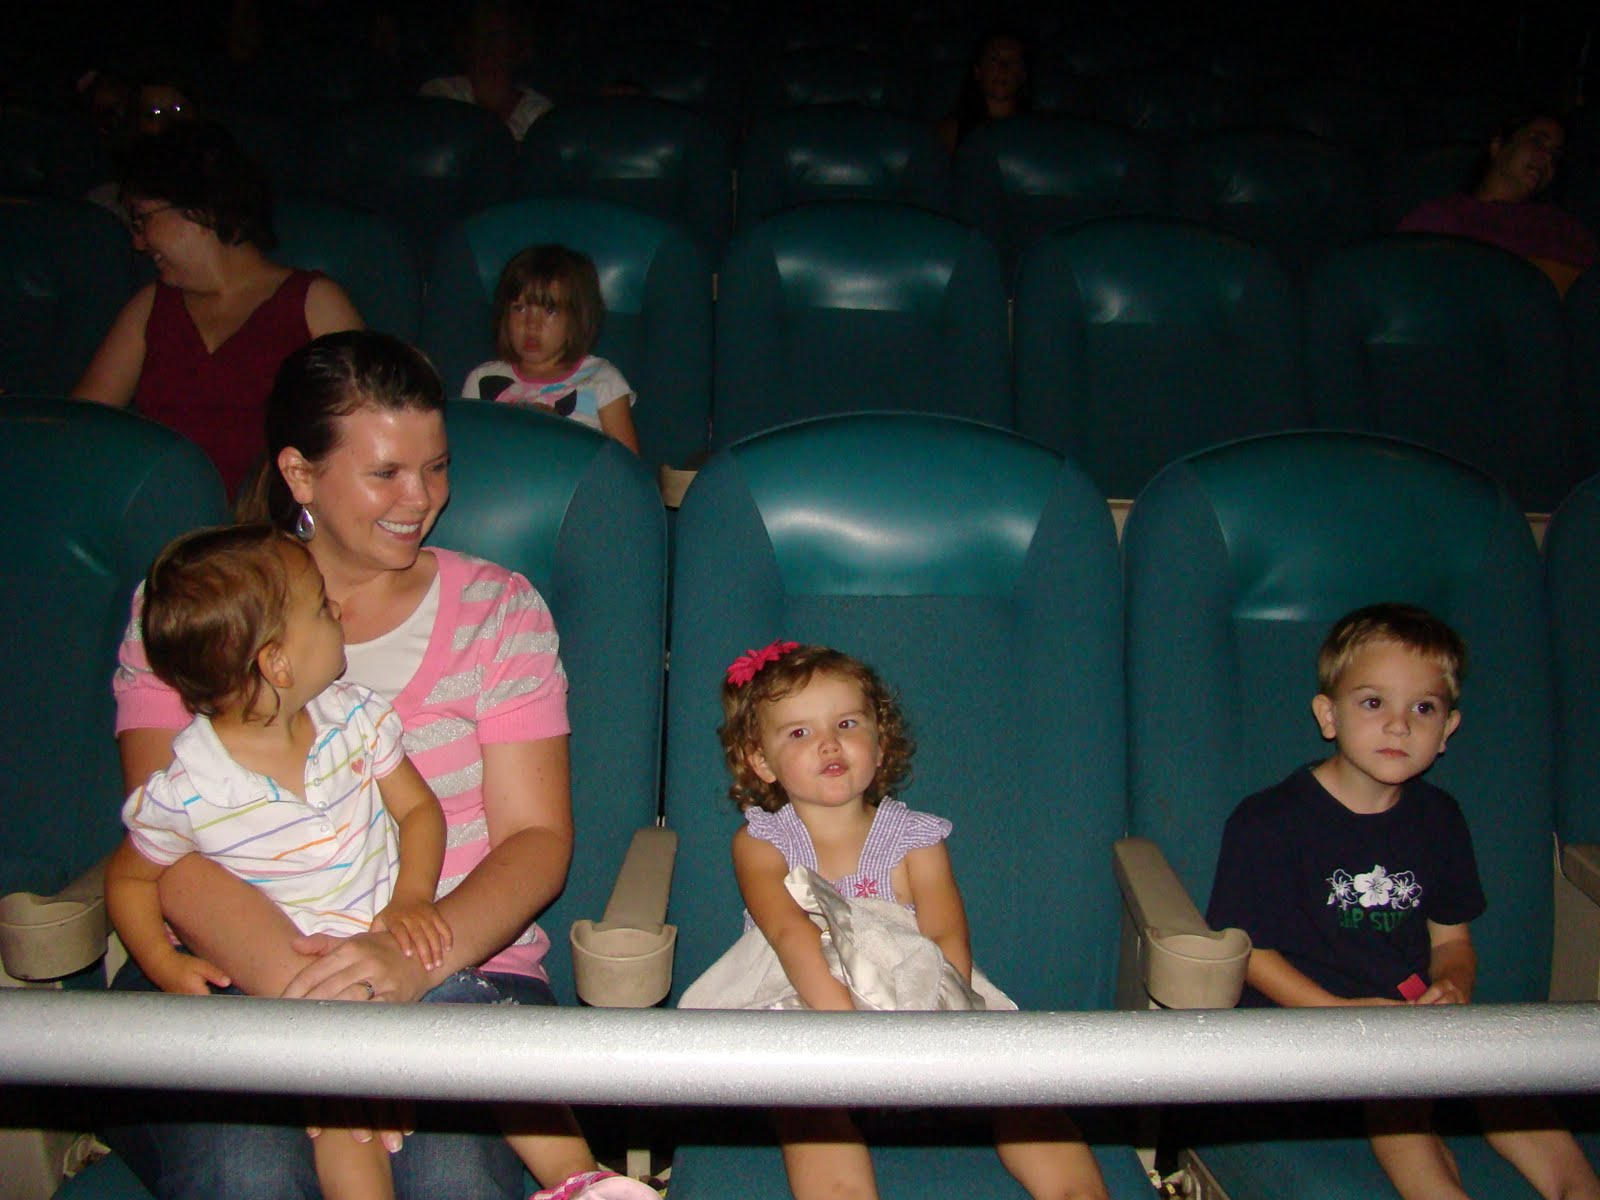 edgemont regal movie theatre active discounts